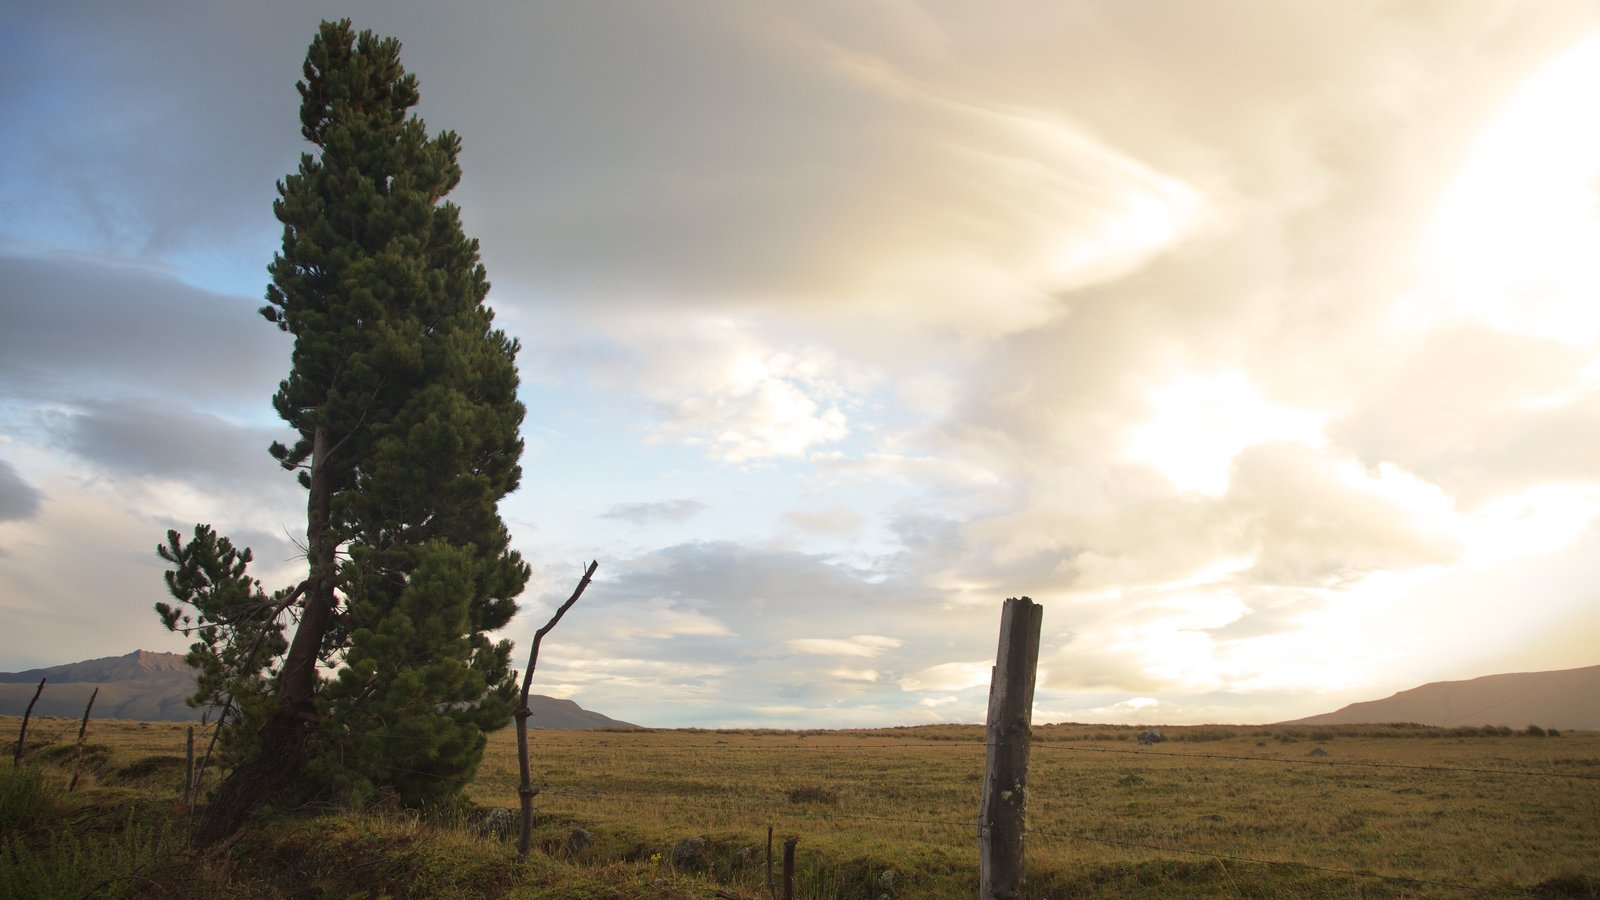 Parque Nacional Cotopaxi que inclui cenas tranquilas